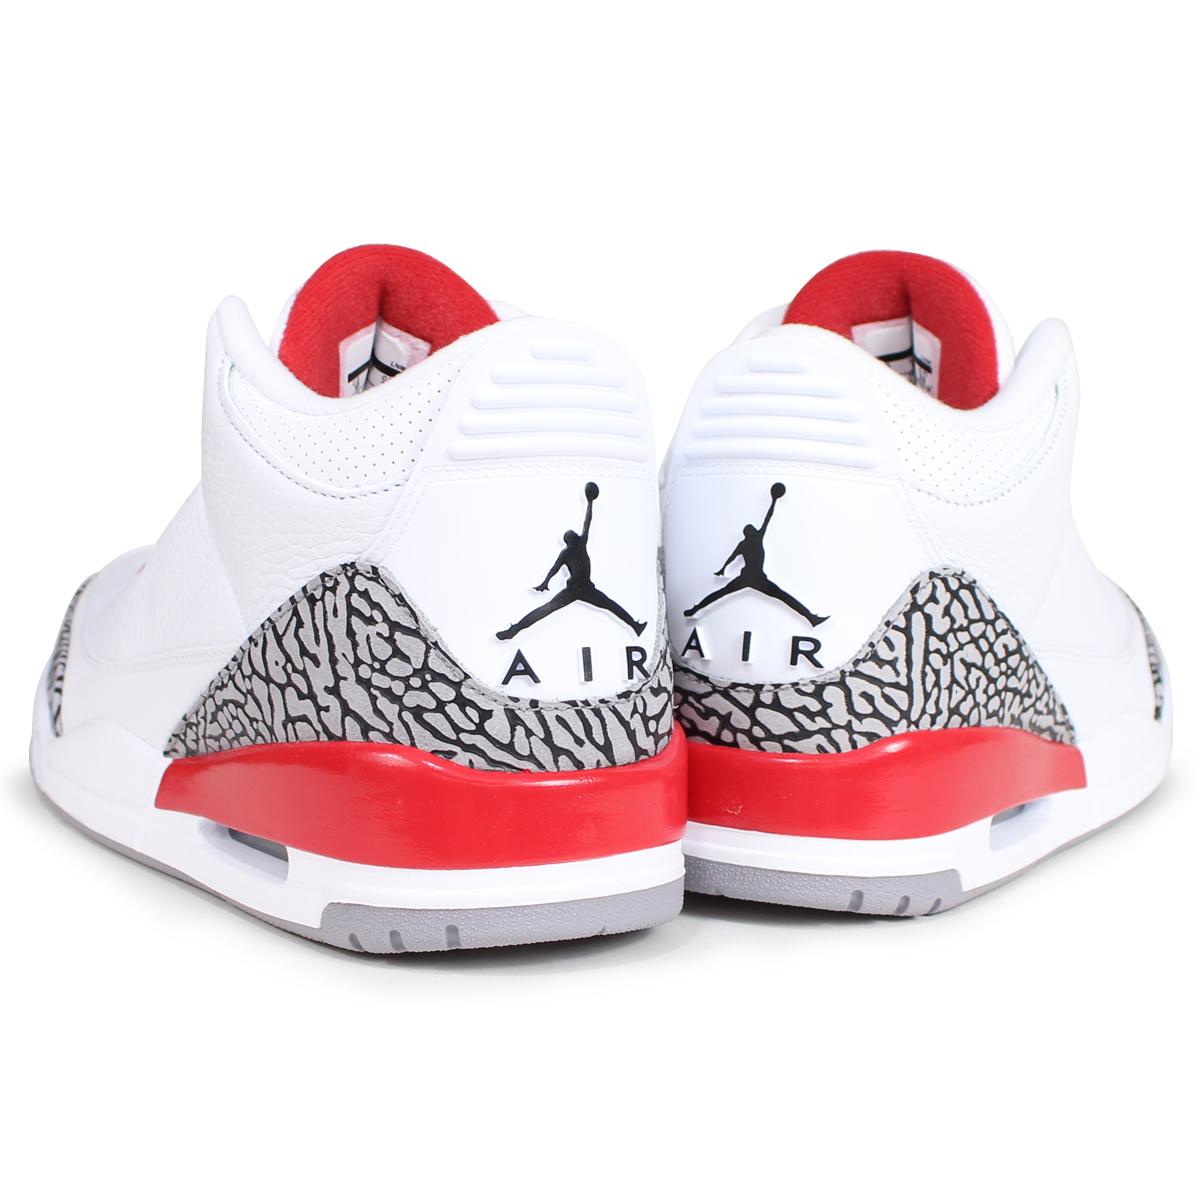 4a20e93f08c2d5 NIKE Nike Air Jordan 3 nostalgic sneakers men AIR JORDAN 3 RETRO KATRINA  136